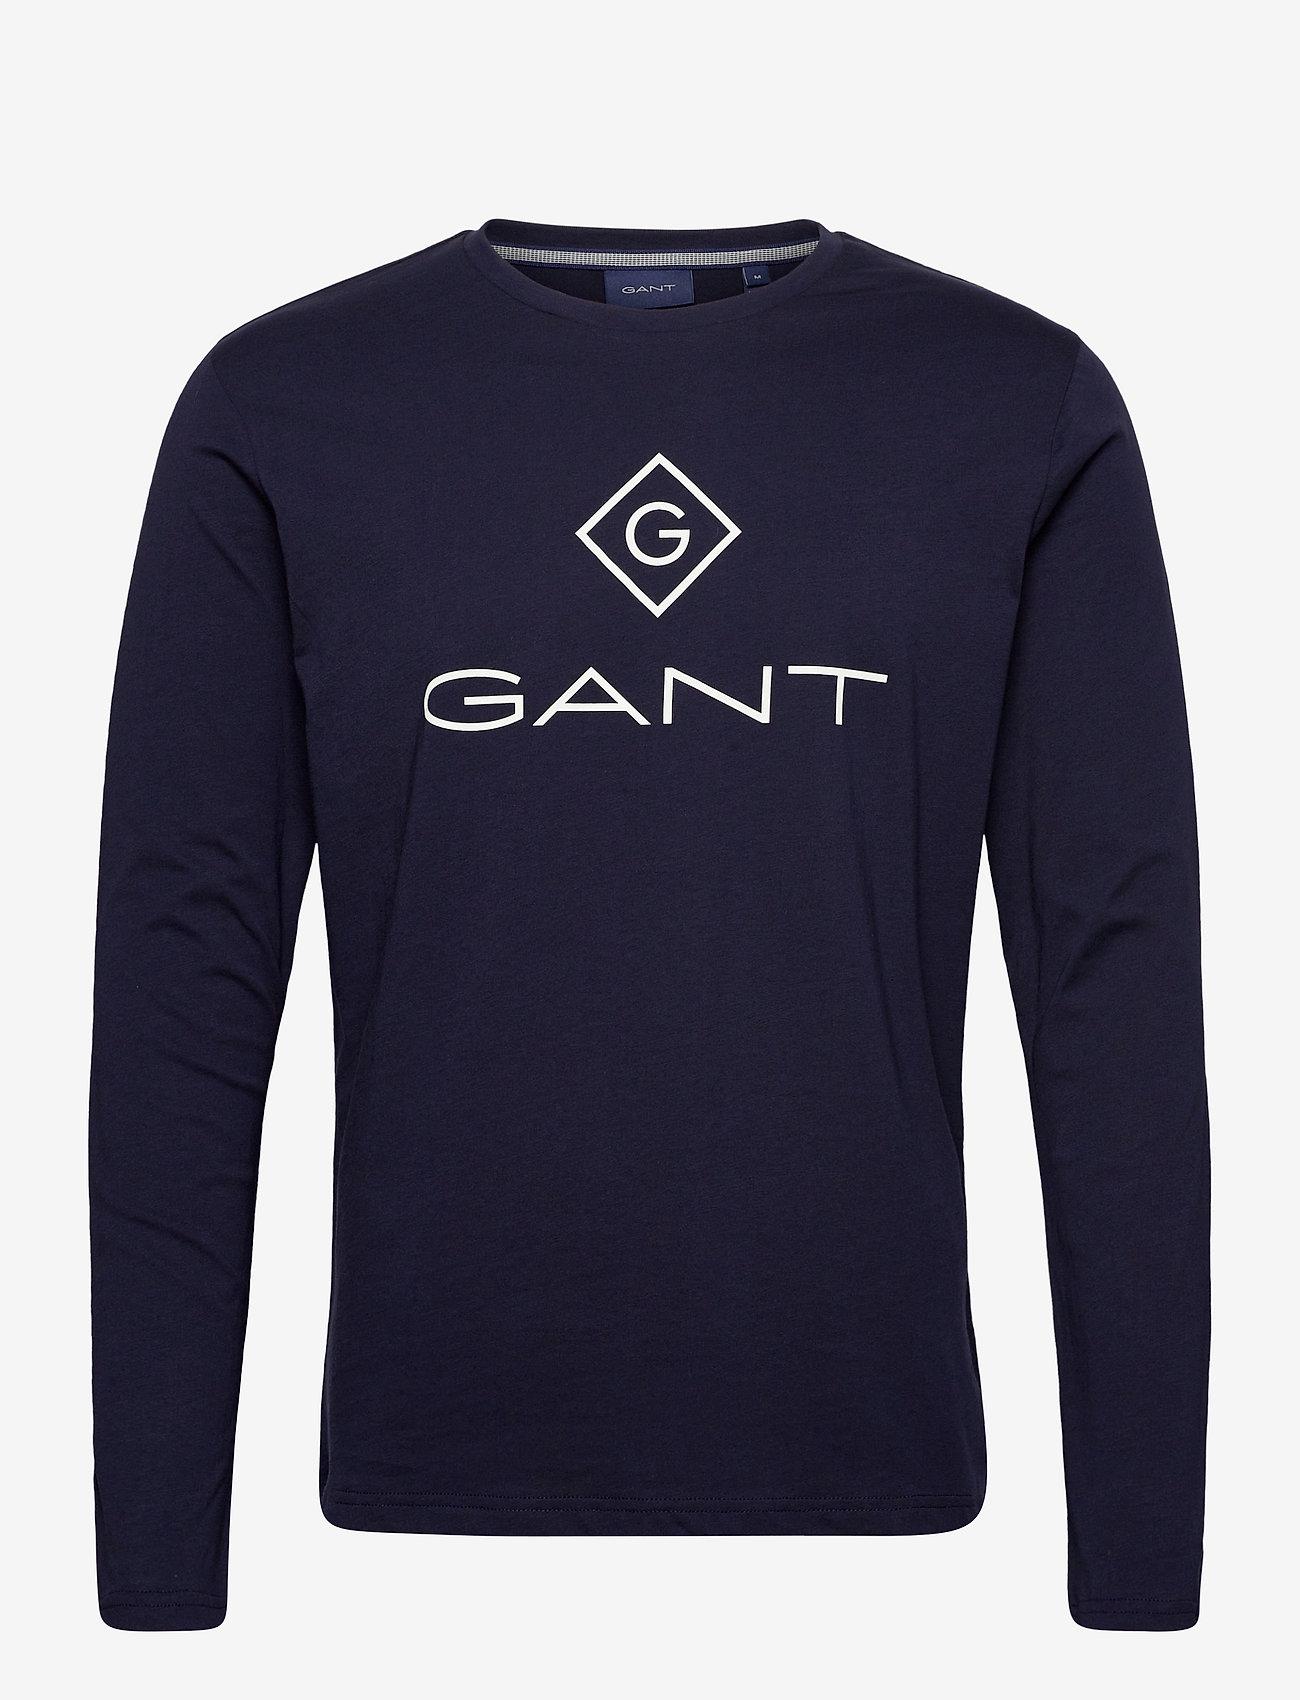 GANT - GANT LOCK UP LS T-SHIRT - long-sleeved t-shirts - evening blue - 0